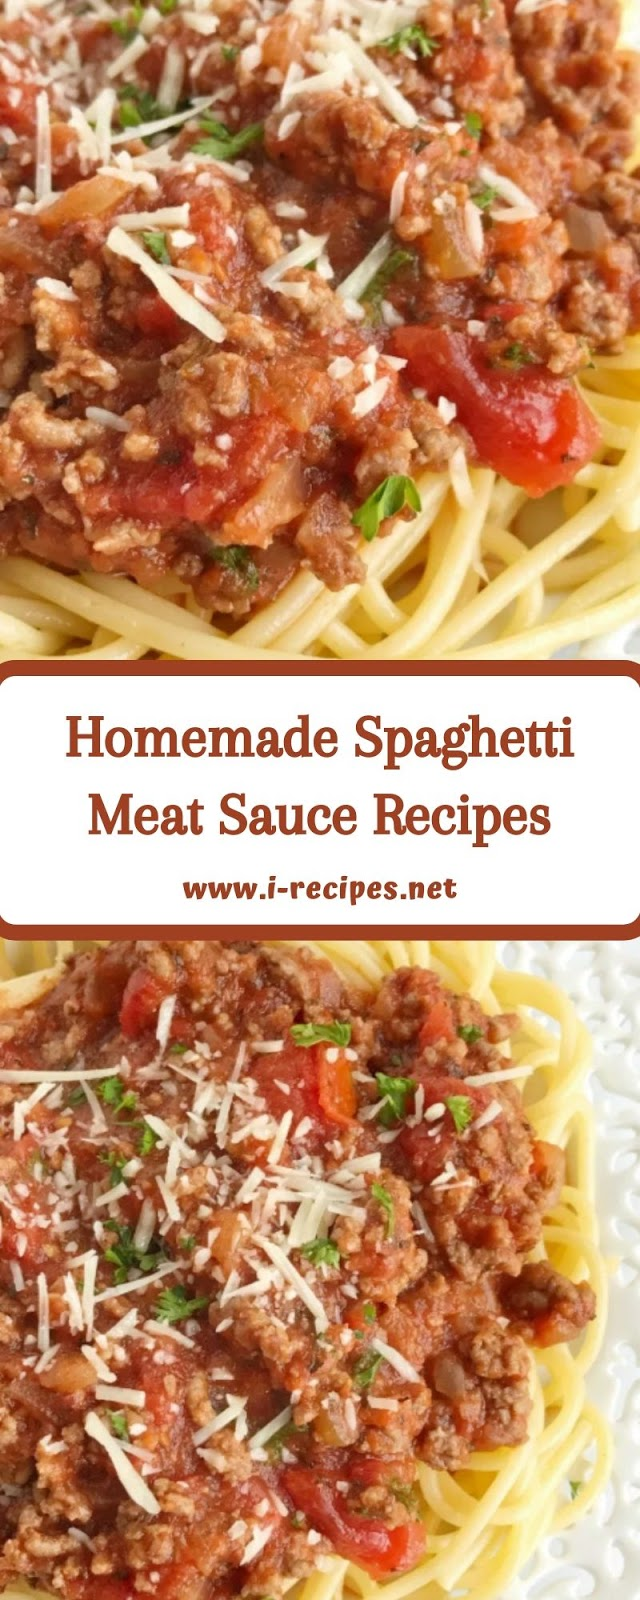 Homemade Spaghetti Meat Sauce Recipes